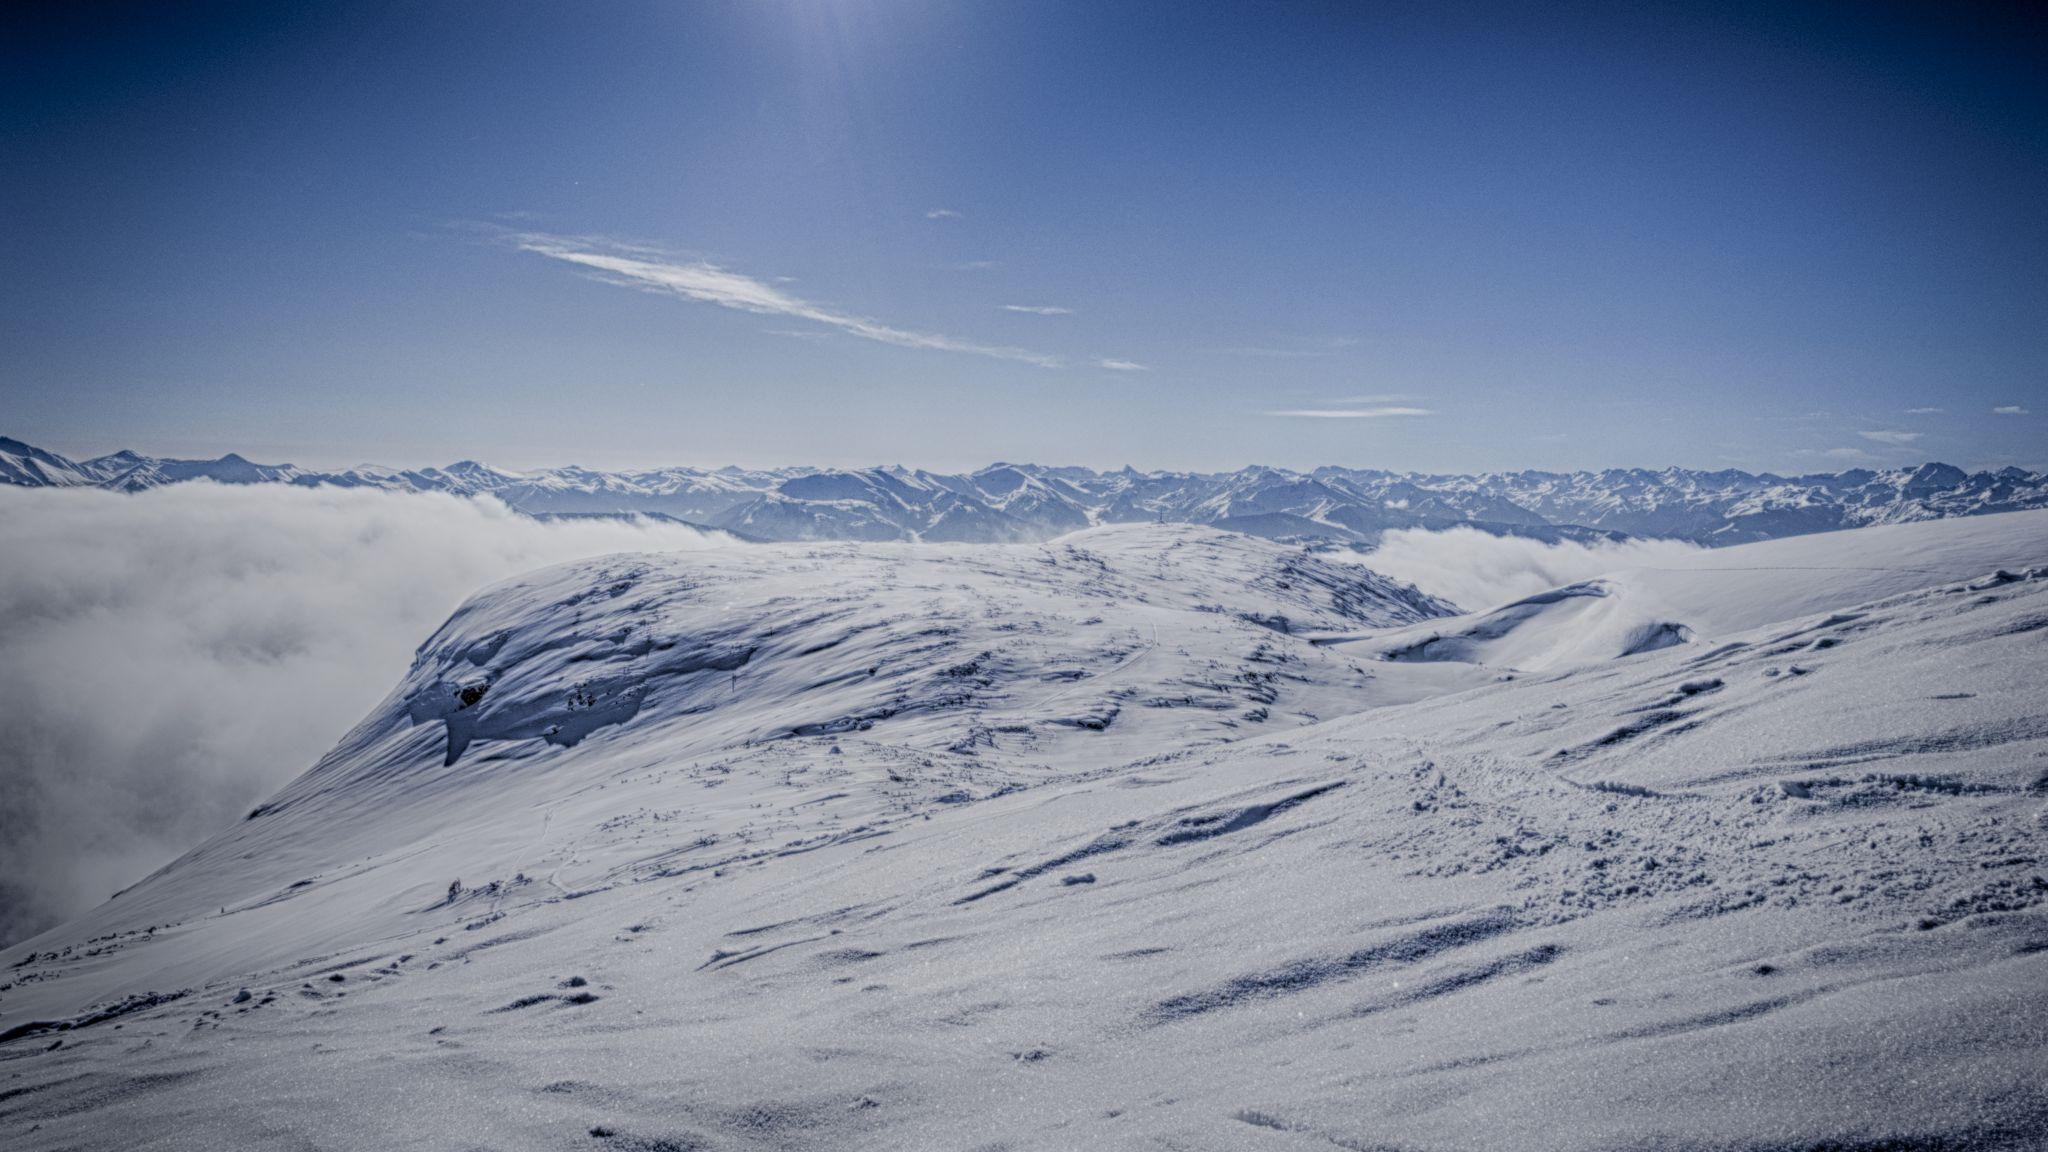 Backcountry-Skiing to Angerkogel, Austria